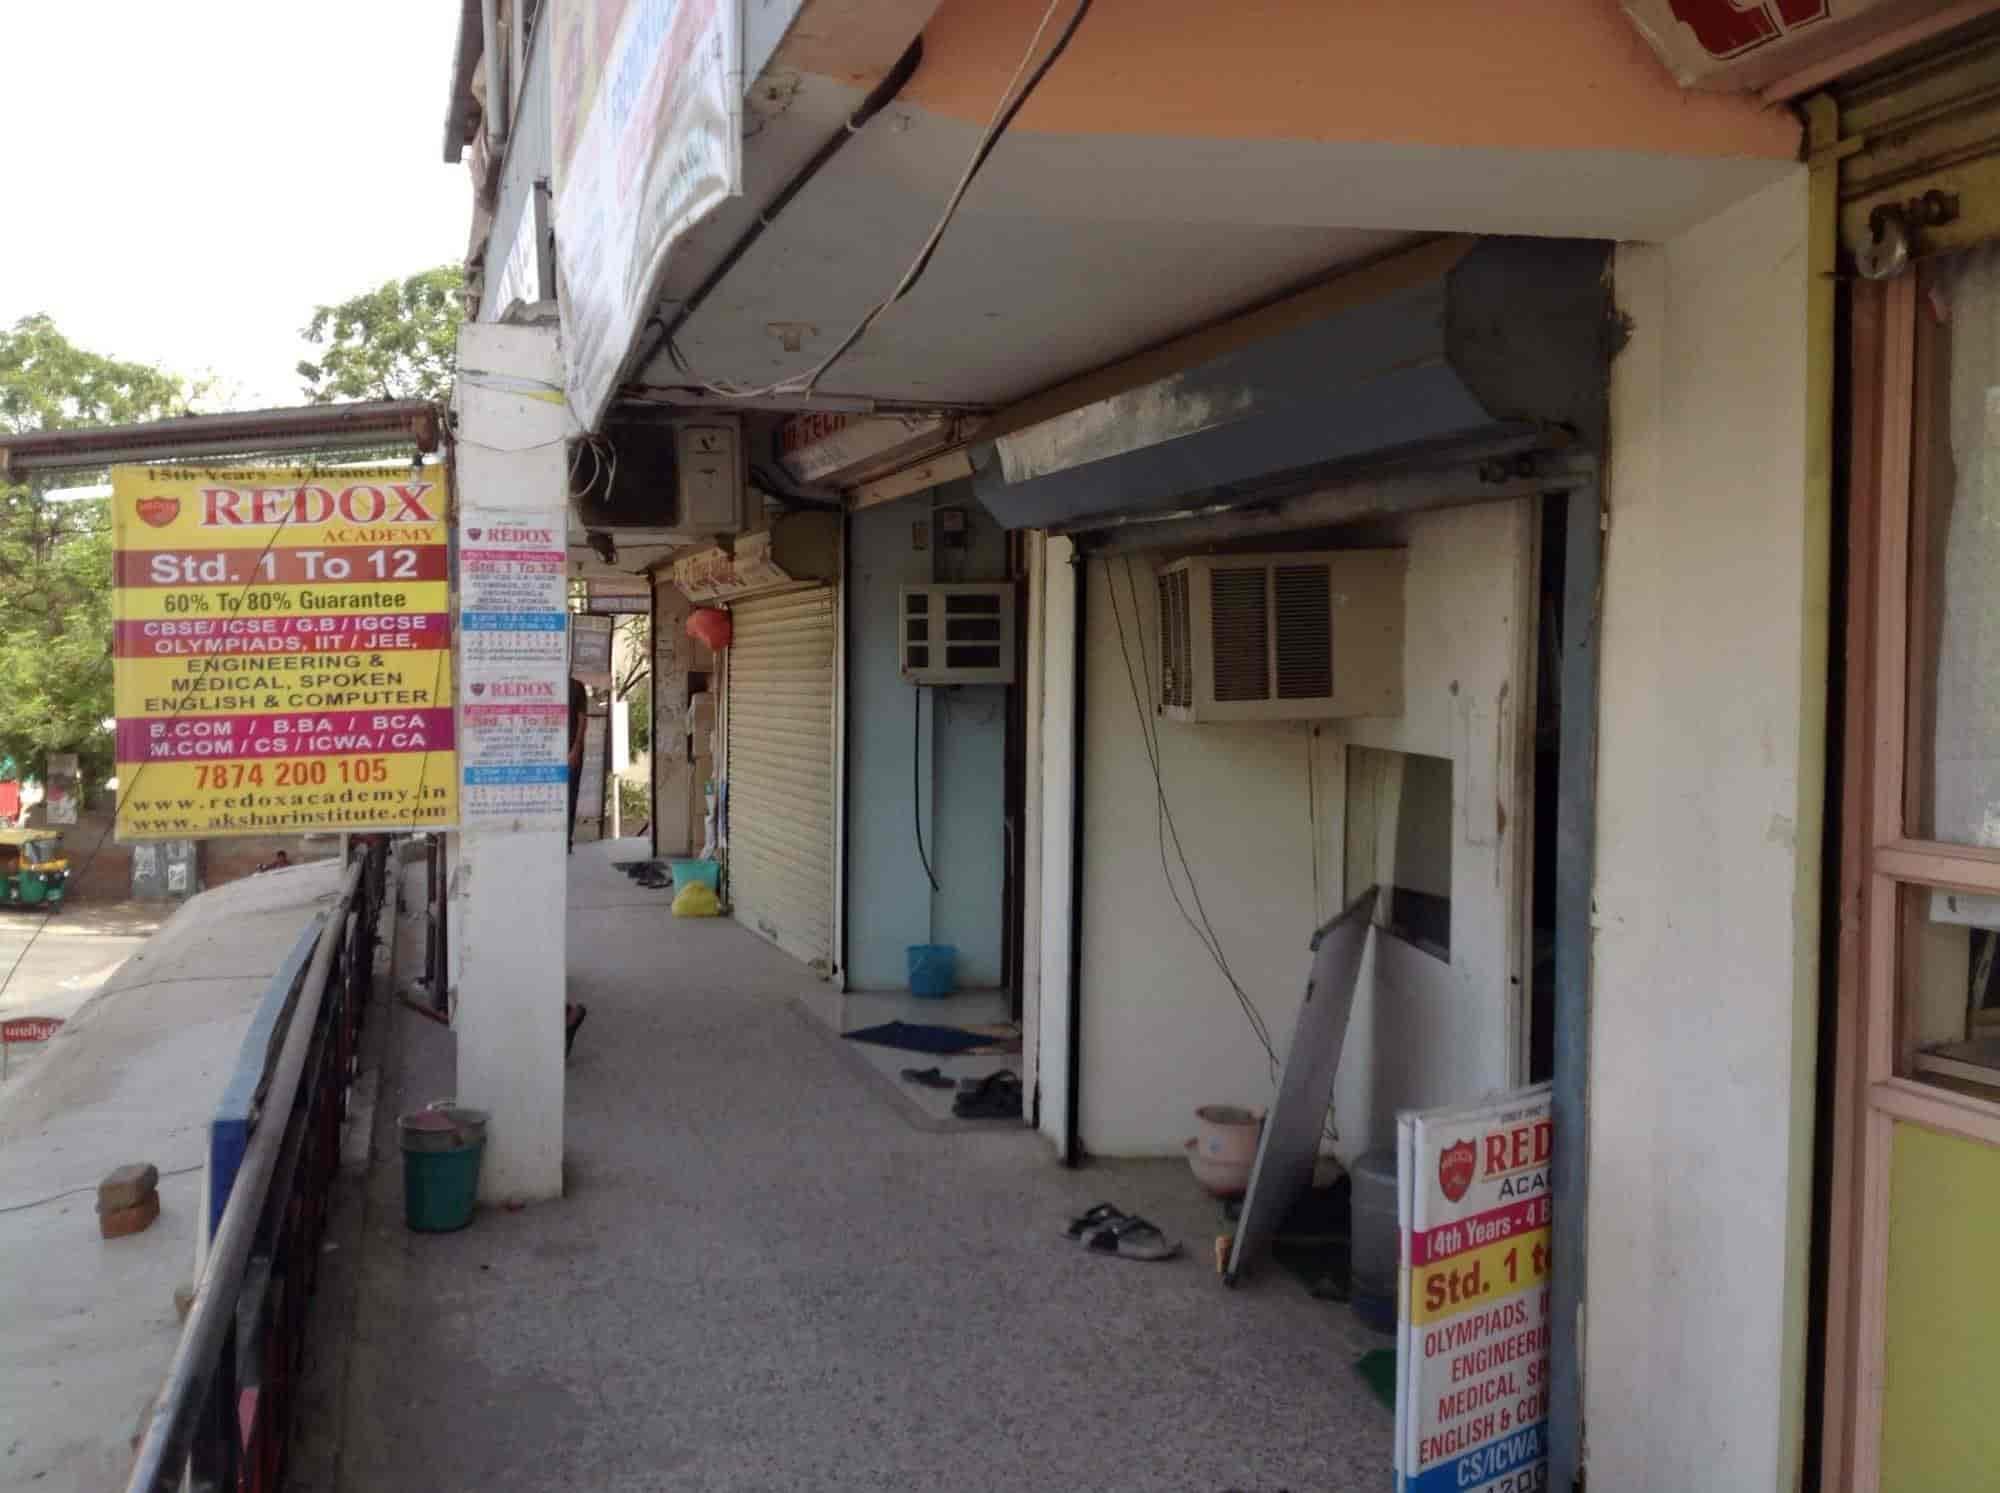 Redox Academy, Jodhpur Tekra - Tutorials in Ahmedabad - Justdial